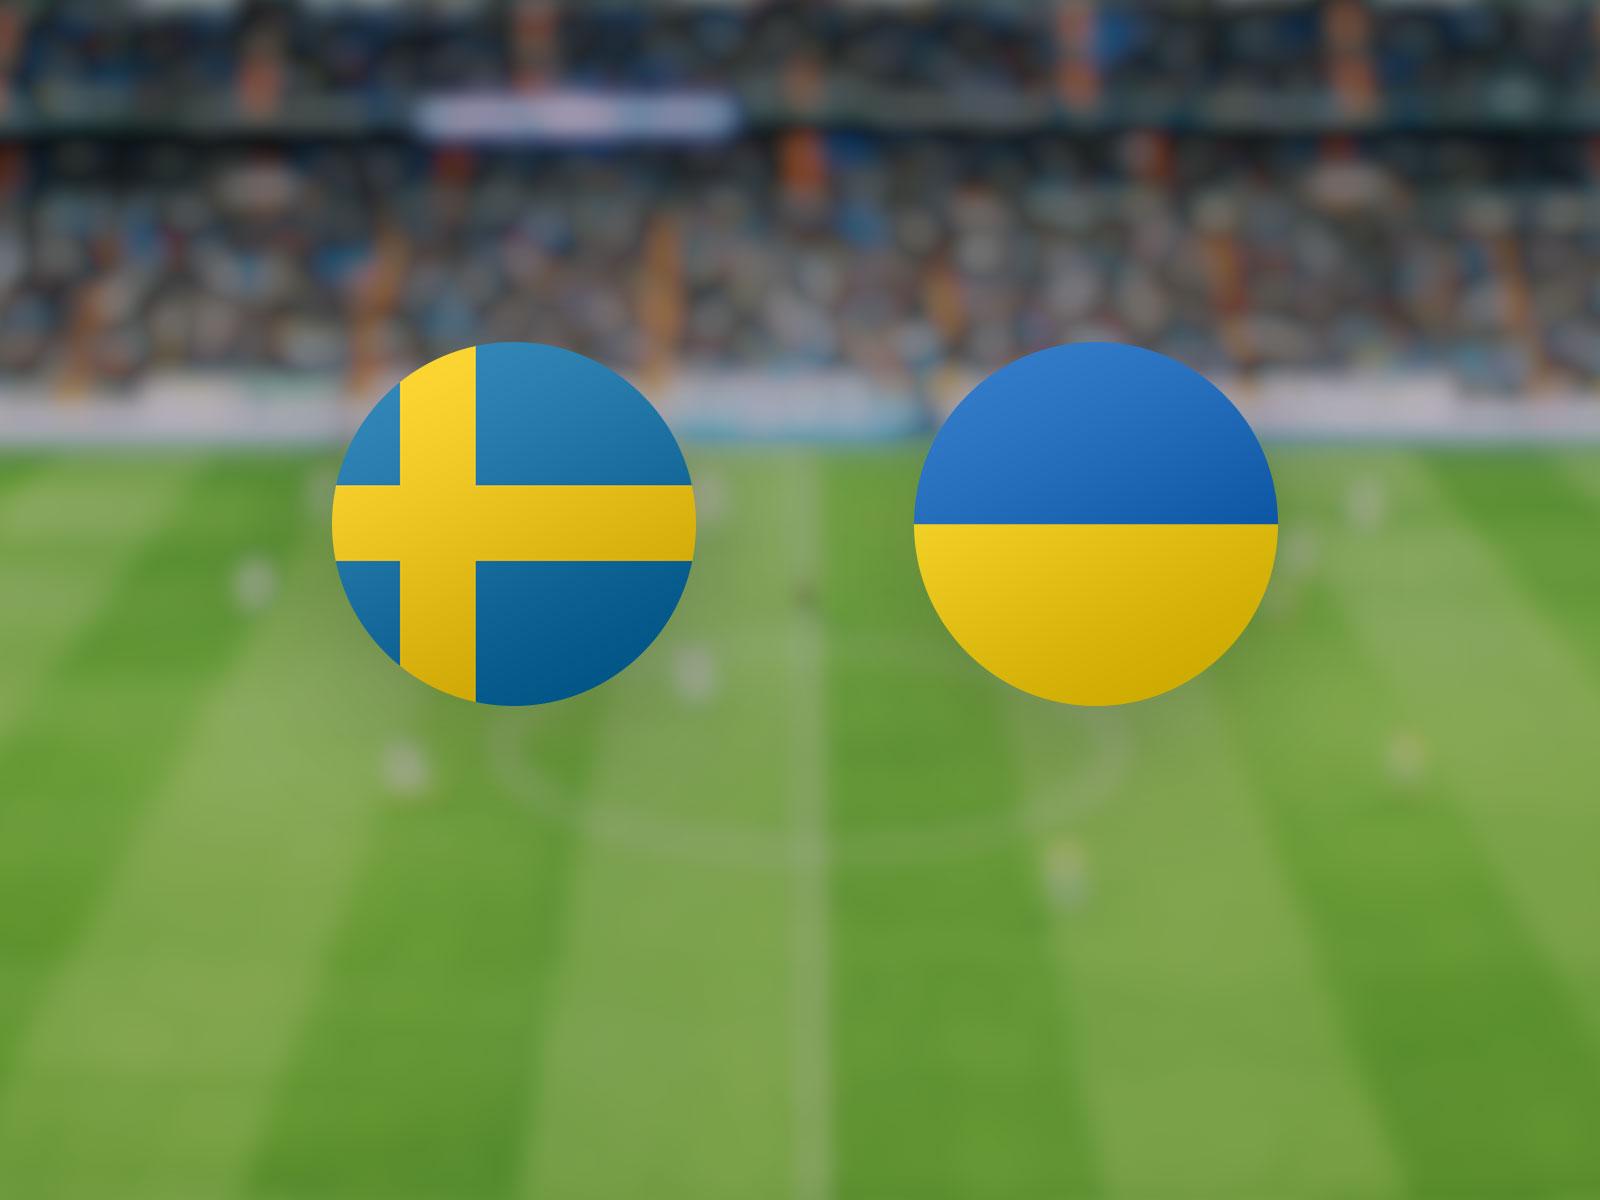 watch Sweden vs Ukraine in Euro 2020 last-16 knockout rounds